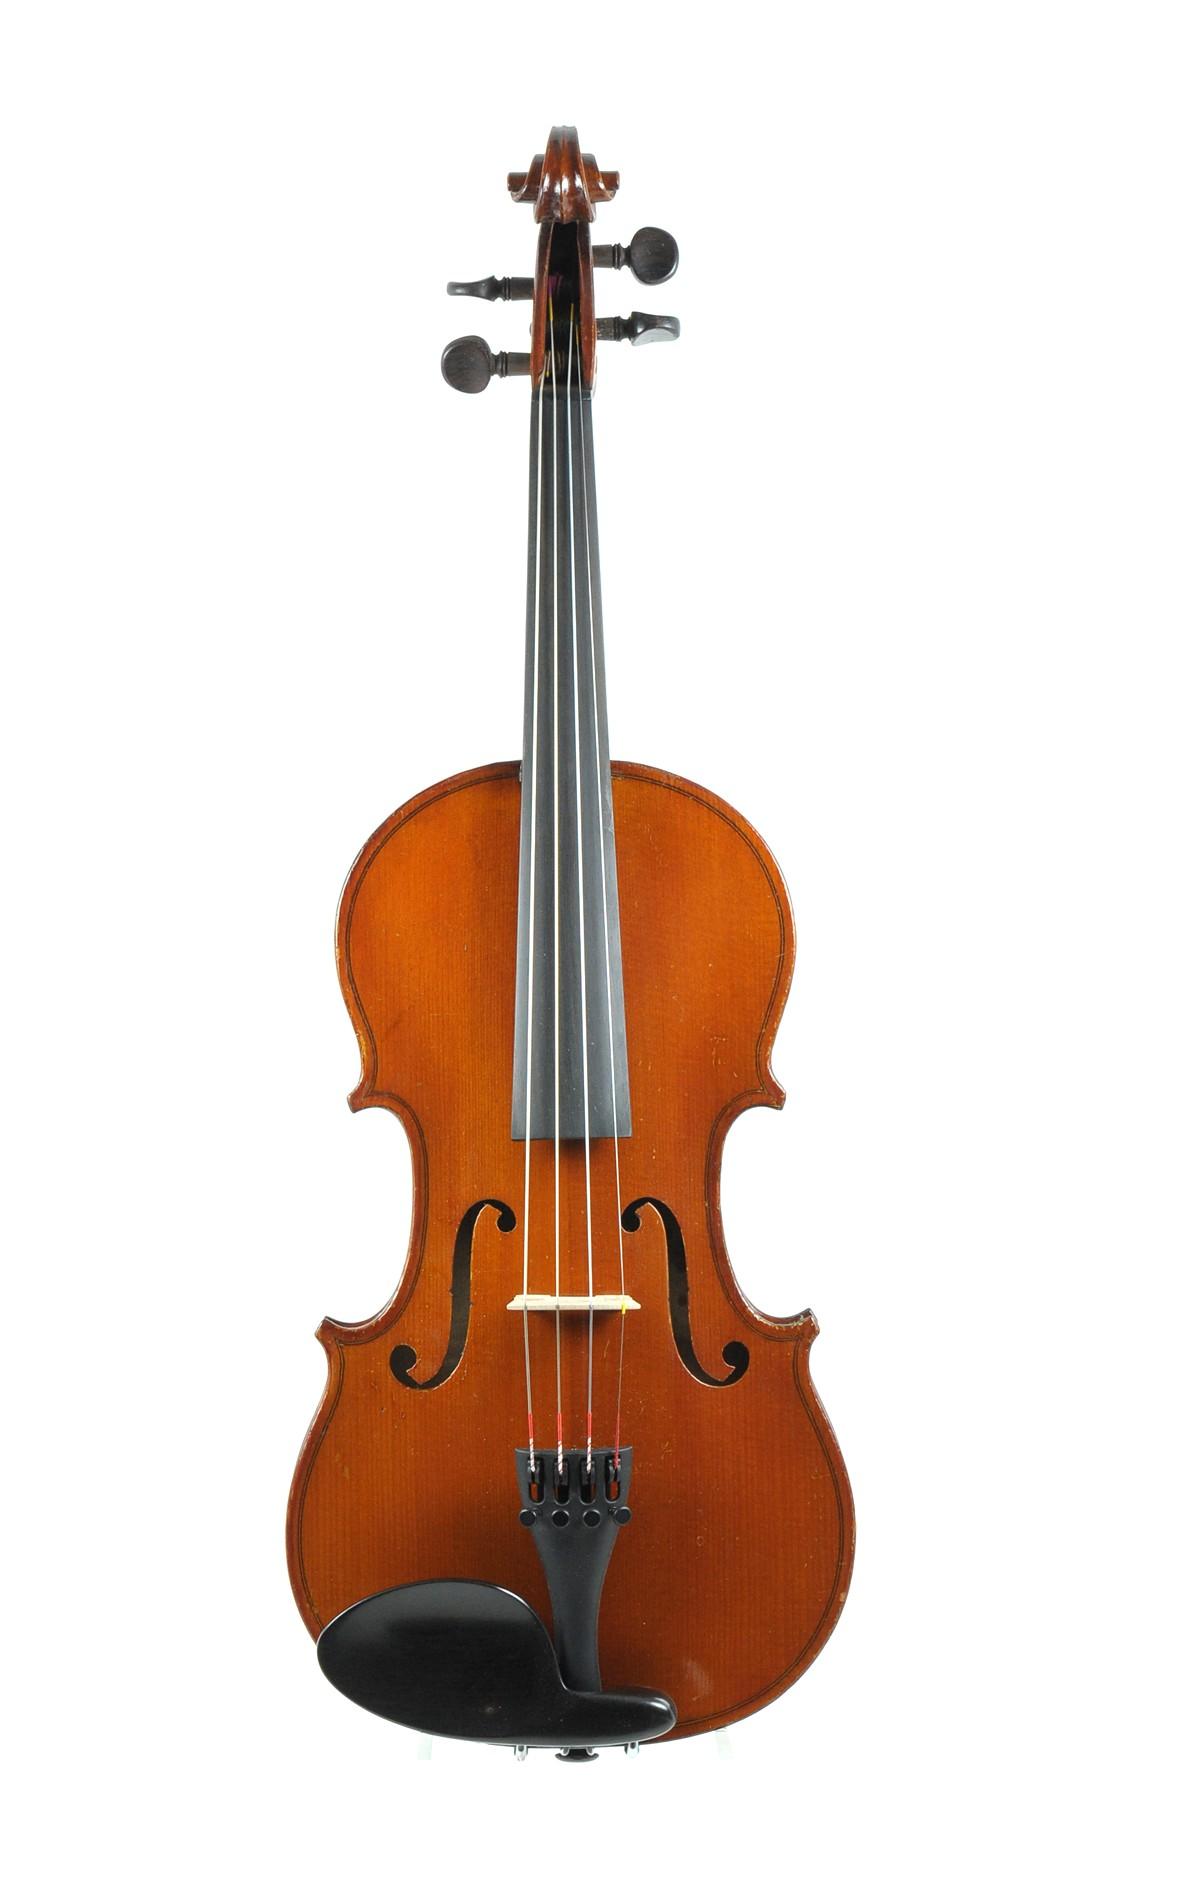 H. Blaise, 3/4 violin, Mirecourt approx. 1910 - top